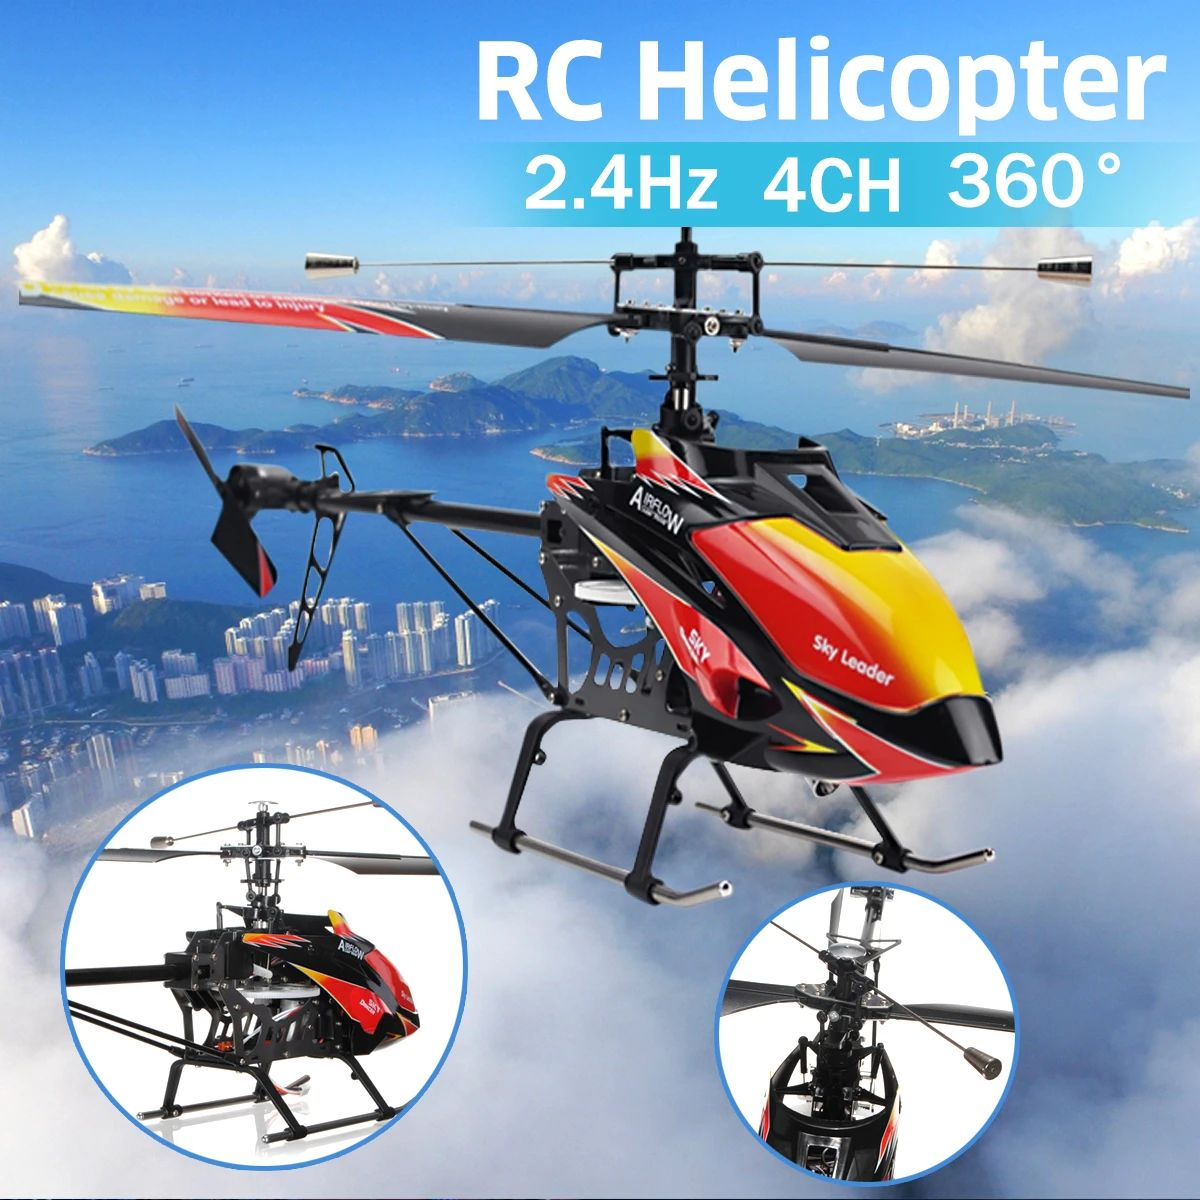 Wltoys V913 Large 27'' 2.4G 4CH Single Blade Built-in Gyro RC Helicopter RTF  https://t.co/xRUhVD1PIn  #Wltoys #V913 #Large #4CH #Single #Blade #Built #in #Gyro #RC #Helicopter #RTF https://t.co/O1pd2o6a9l